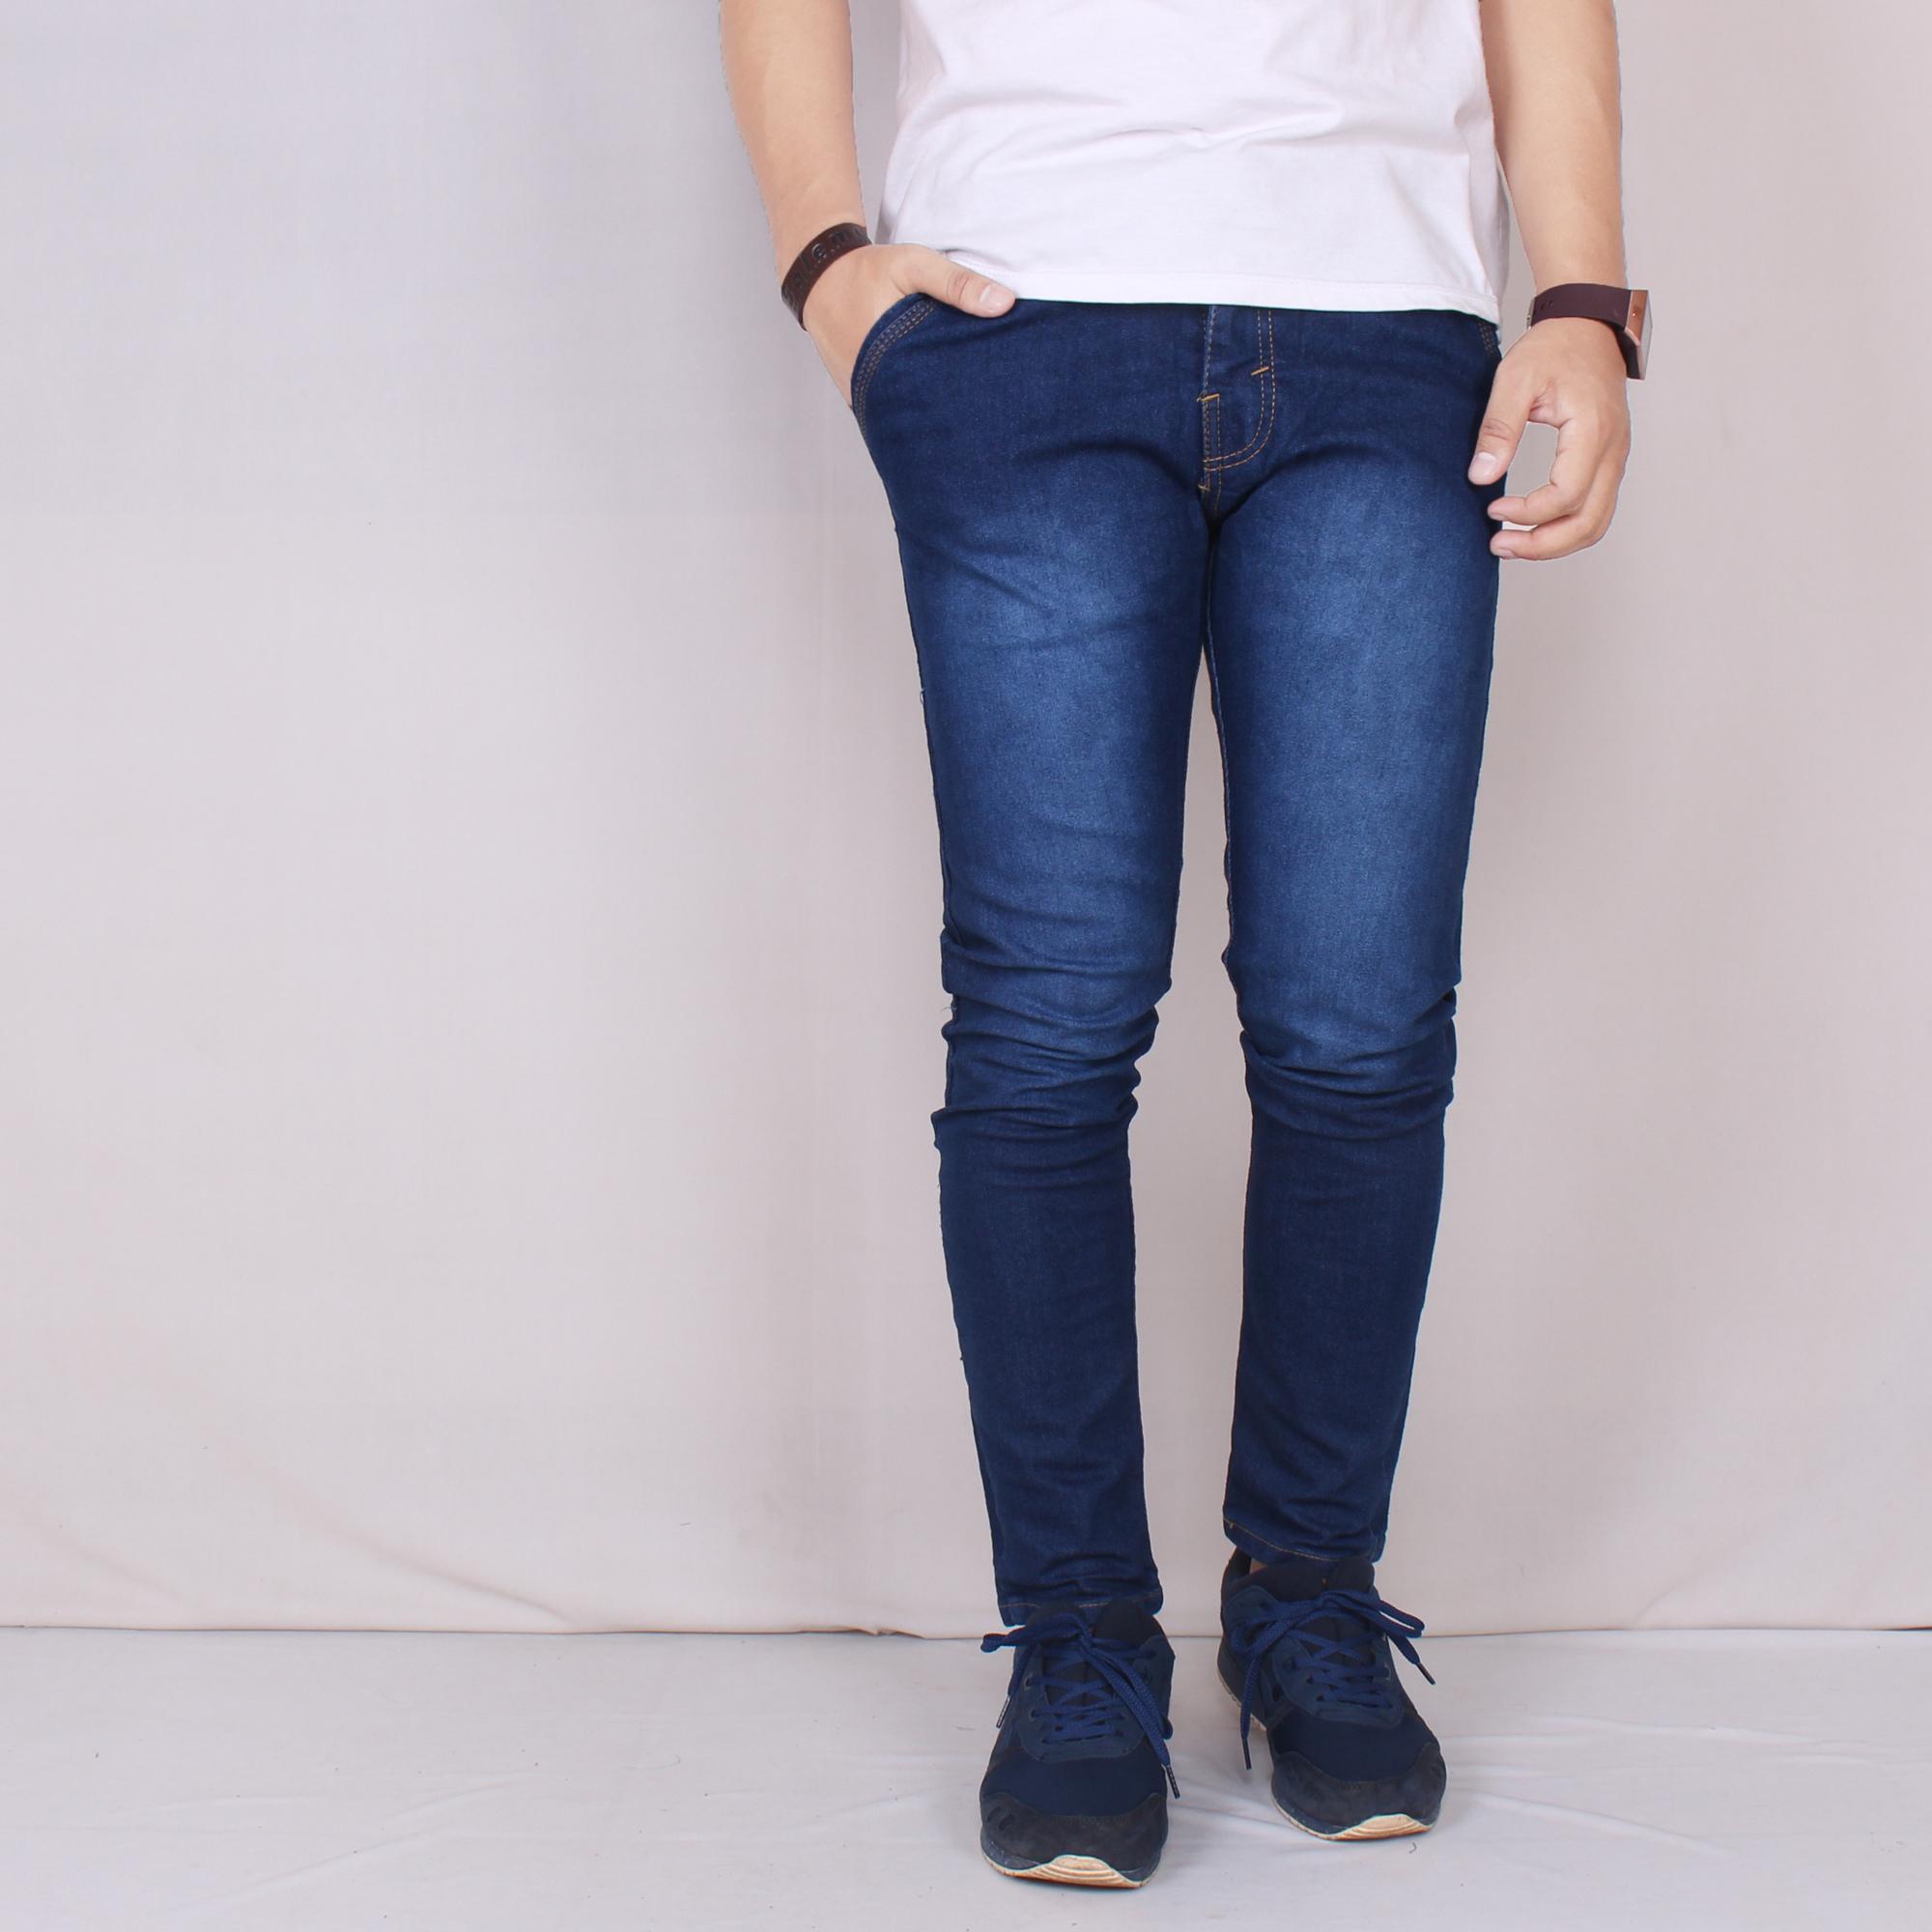 Zoeystore 5602 Celena Jeans Panjang Pria Celana Jeans Skinny Cowok Washing Bluesky Celana Jeans Slimfit Denim STRETCH